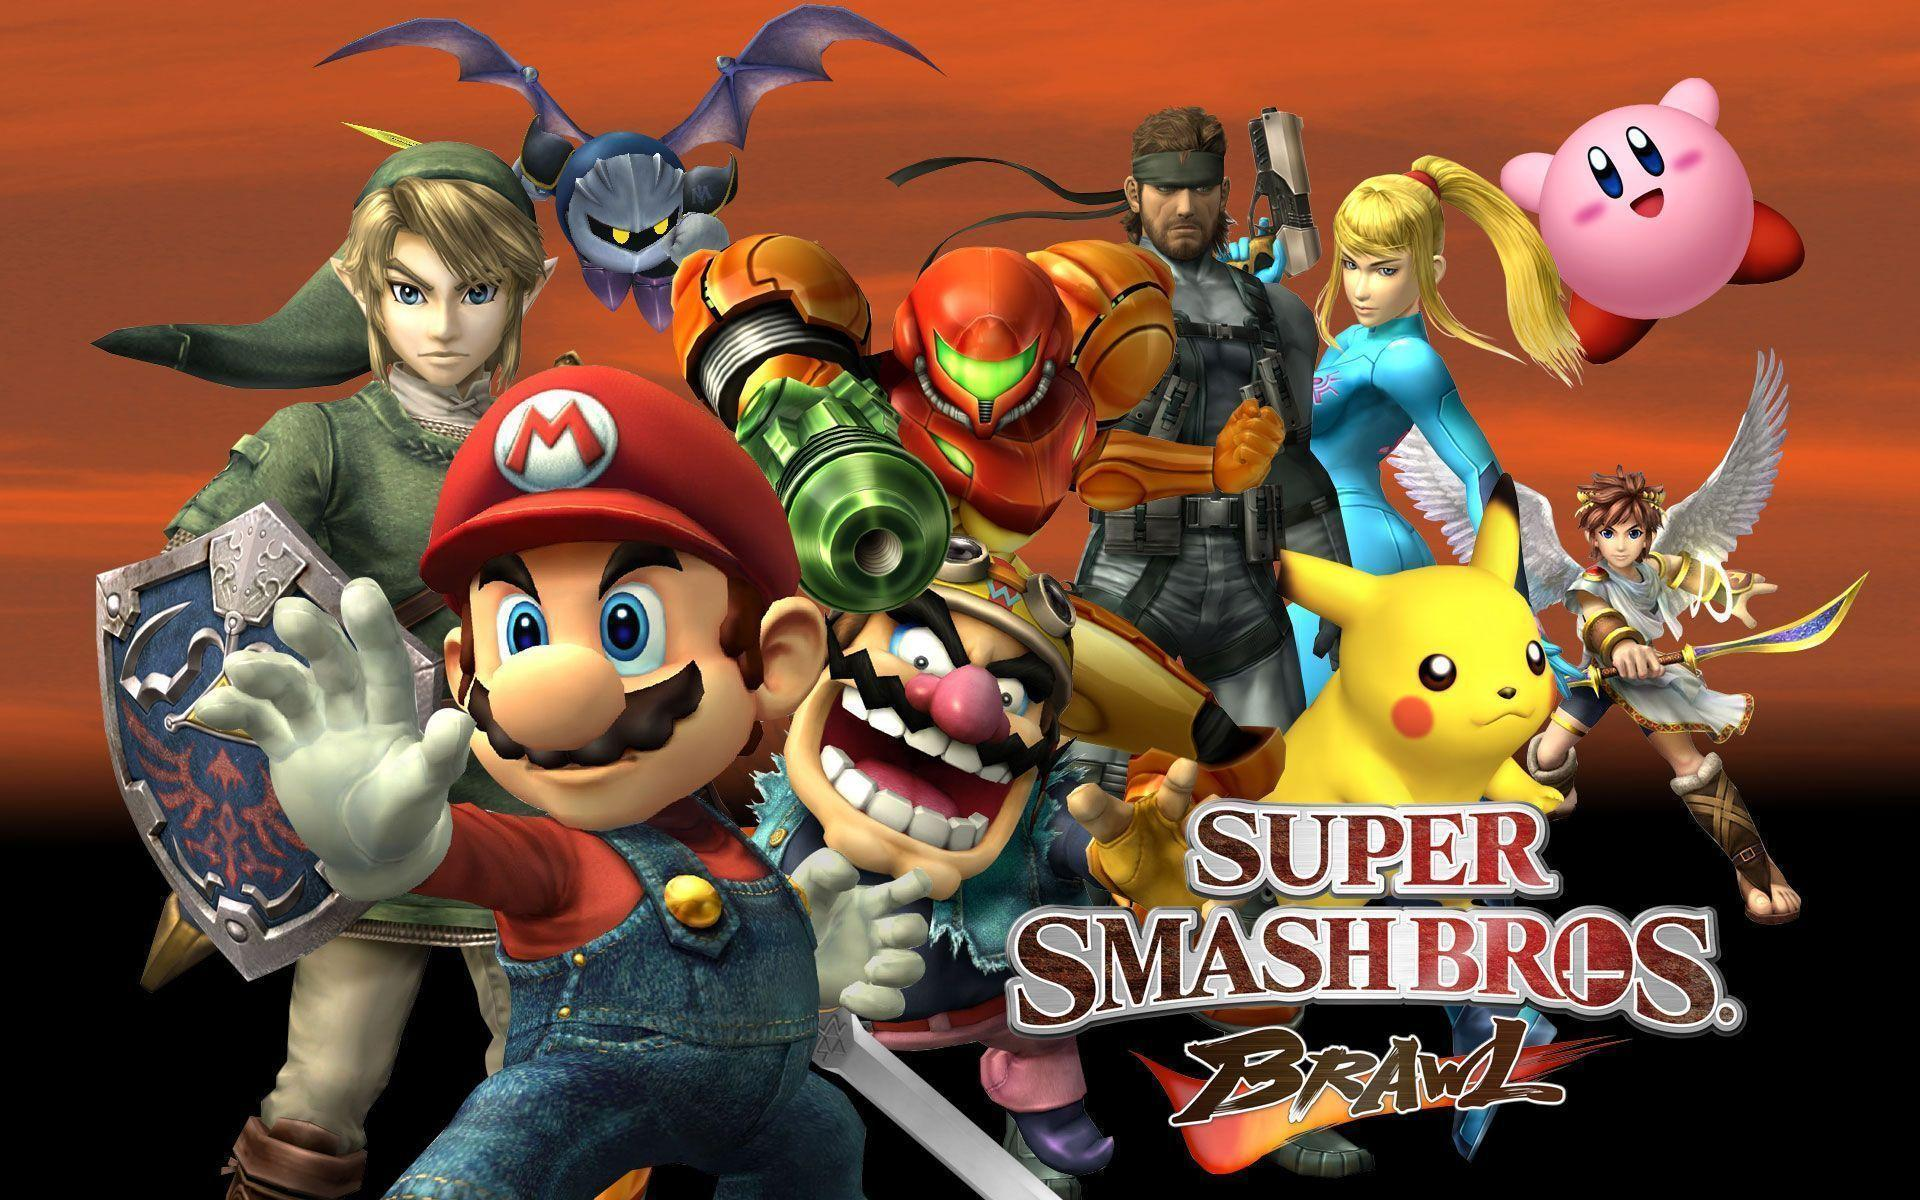 Official Art - Super Smash Bros. Brawl - Last Minute Continue